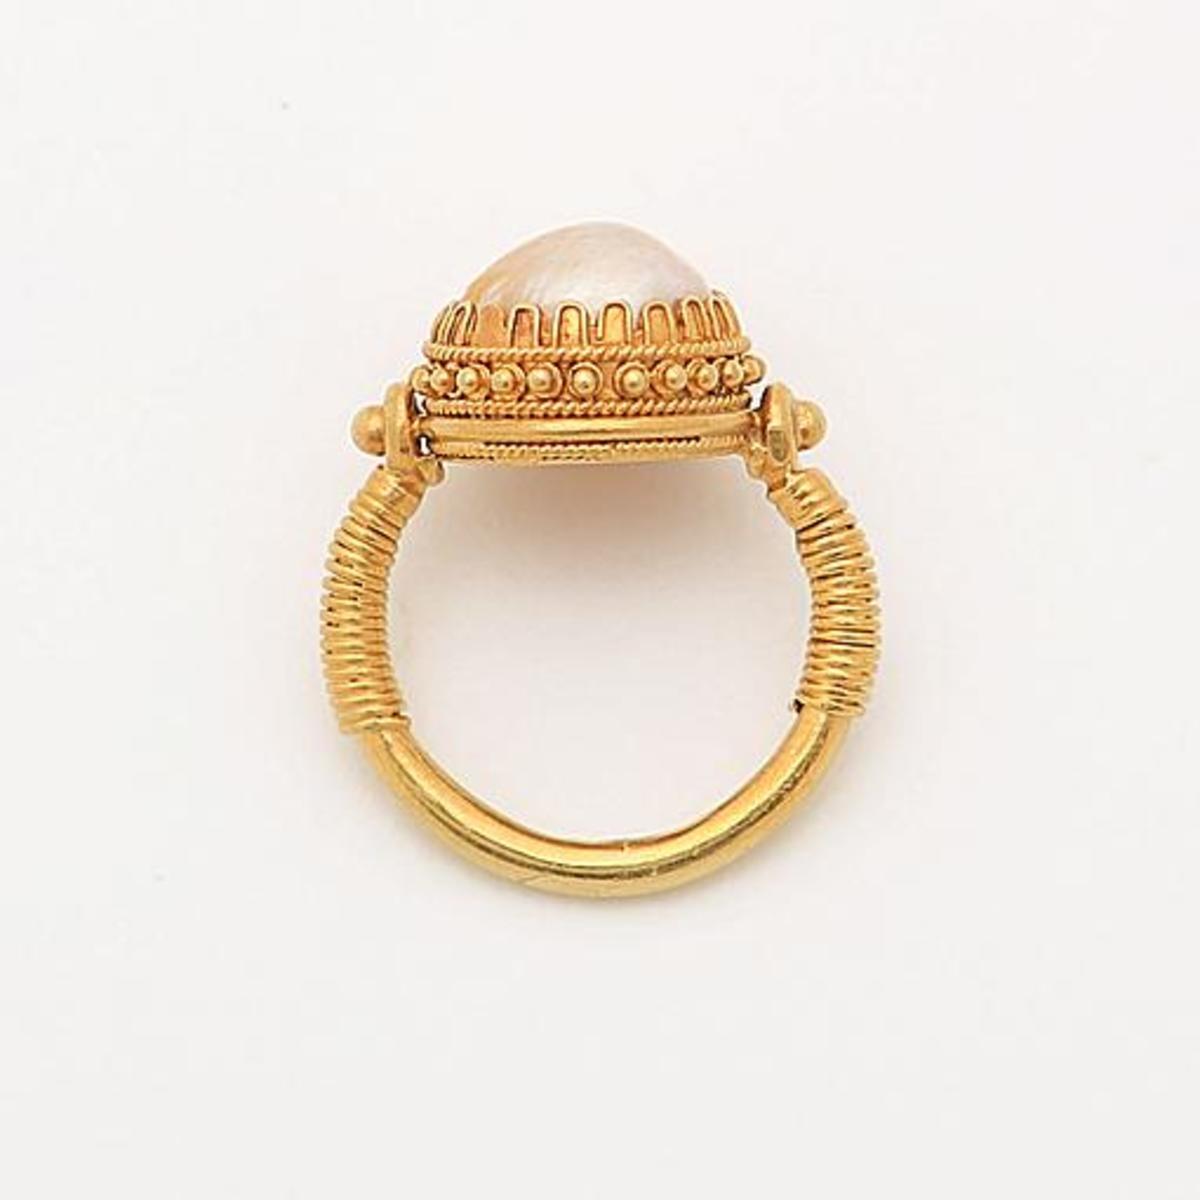 Castellani pearl ring